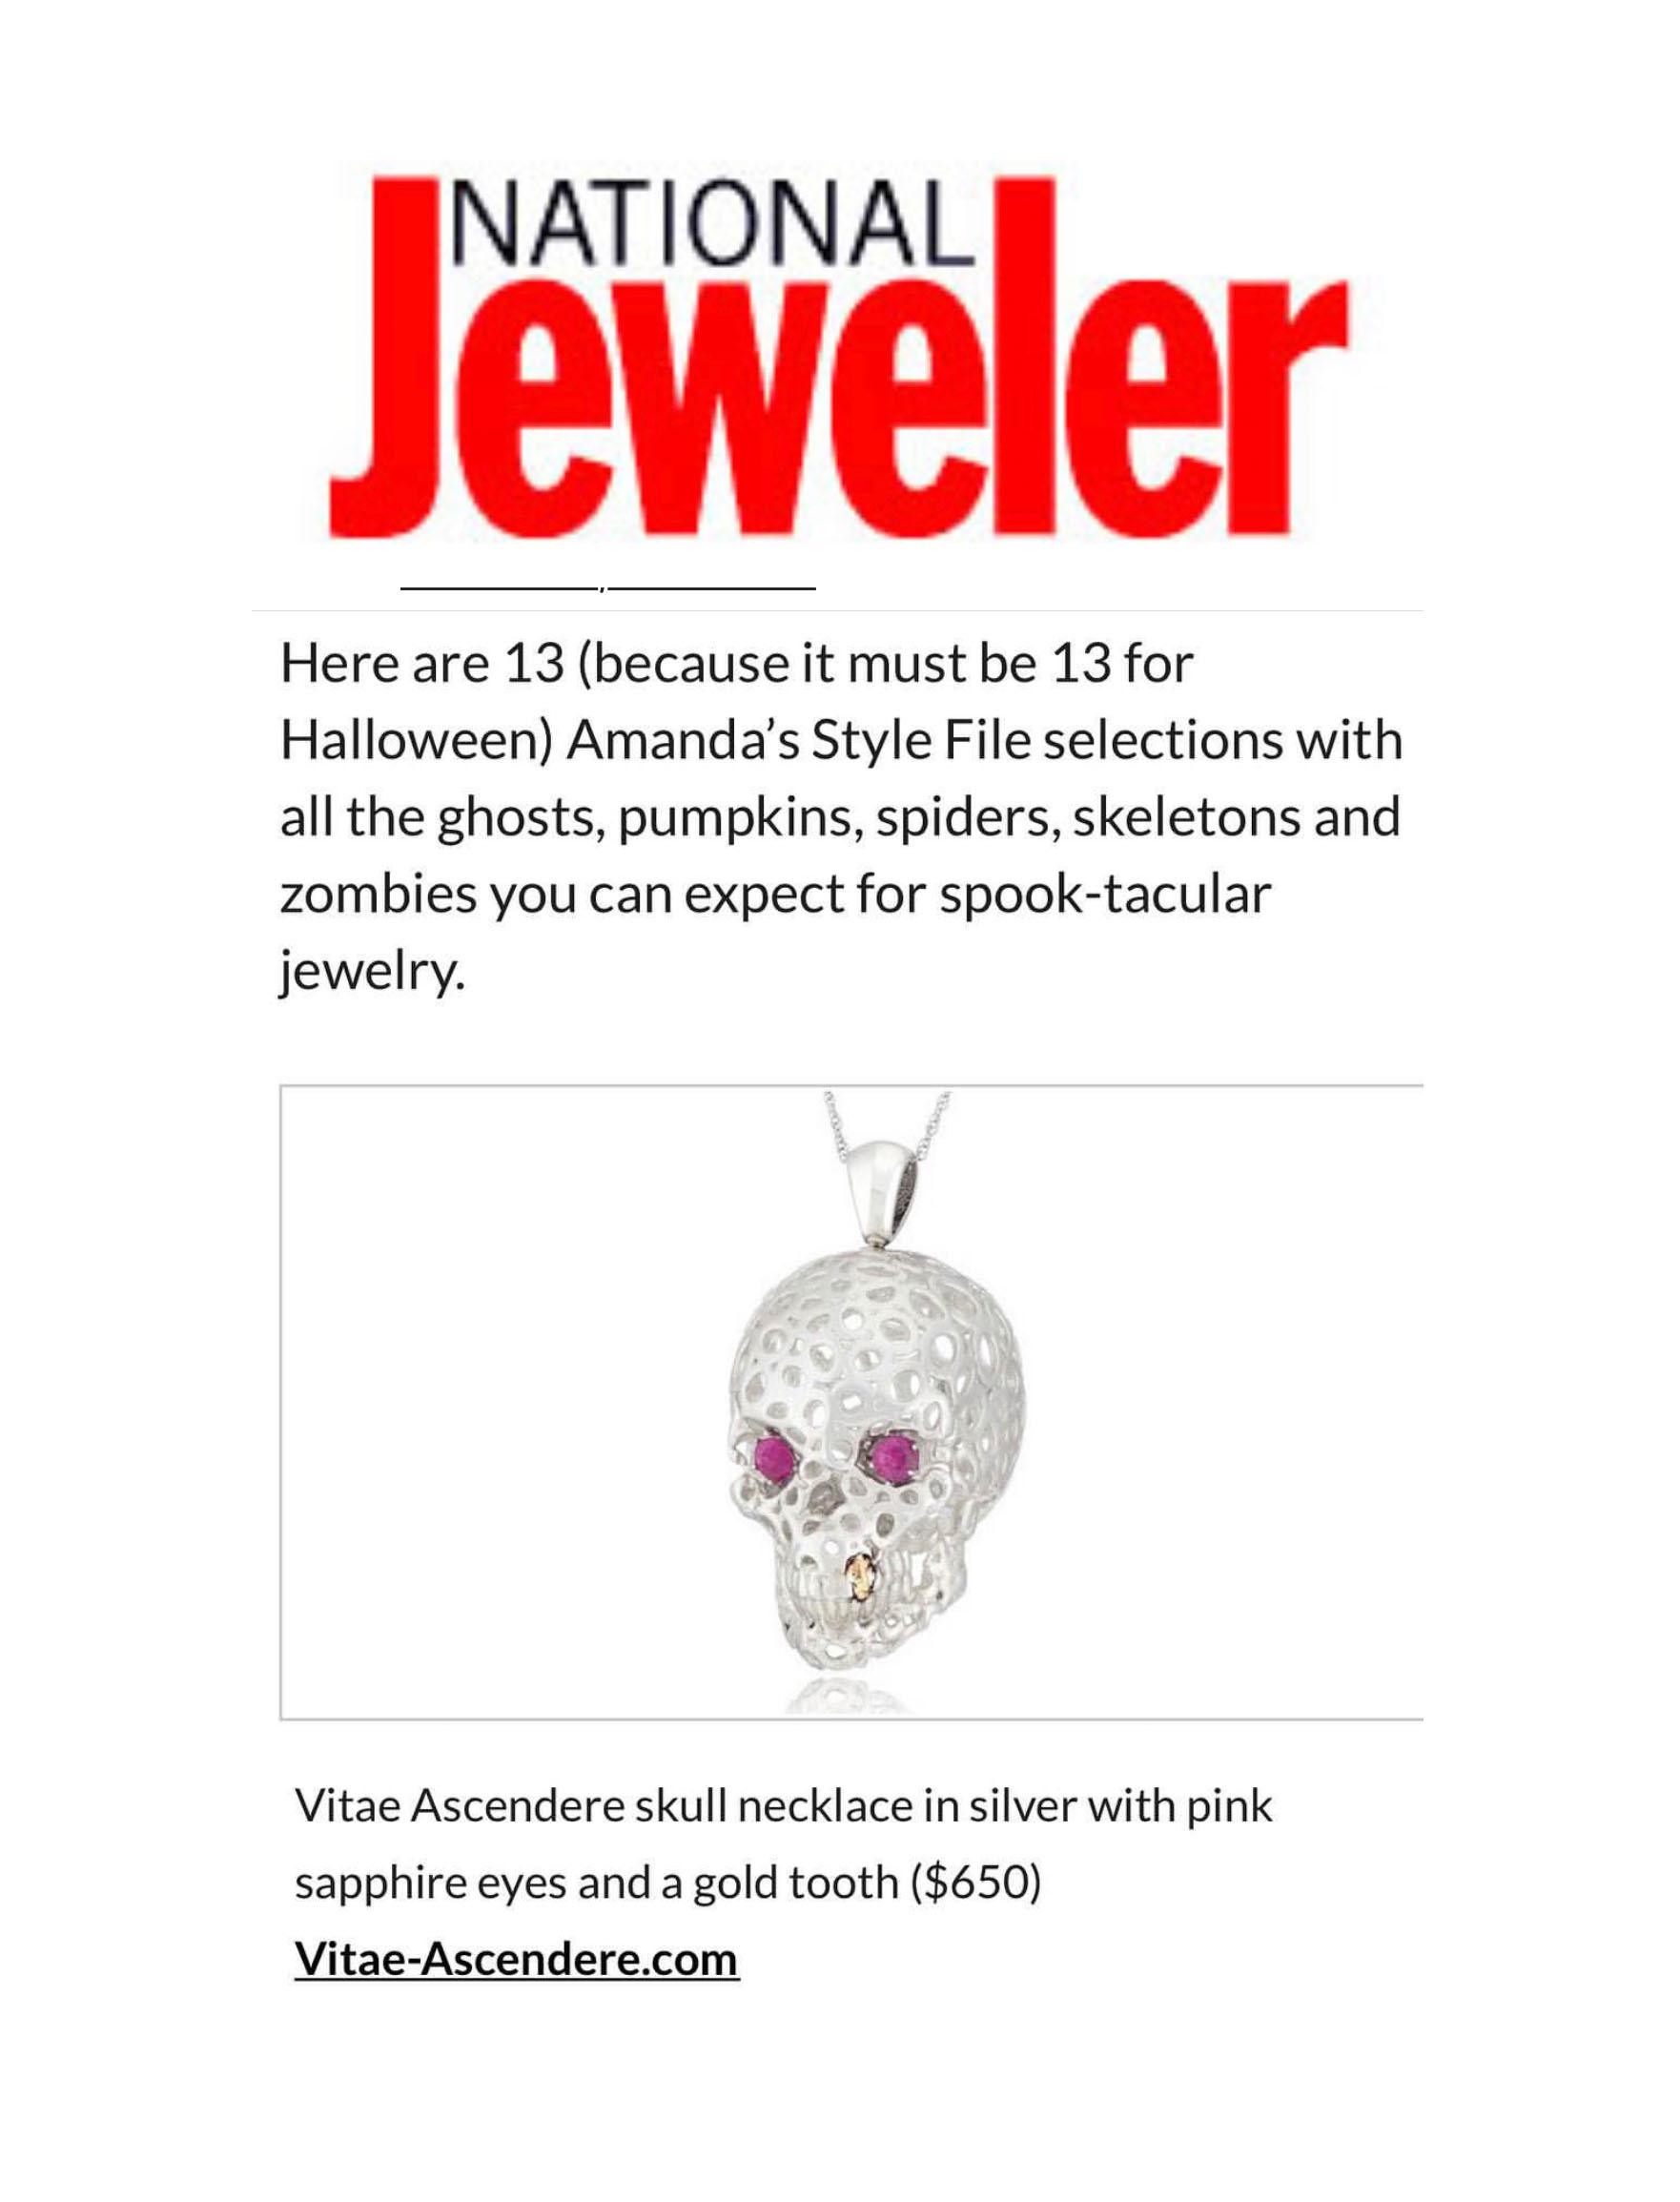 National Jeweler Feature.jpg